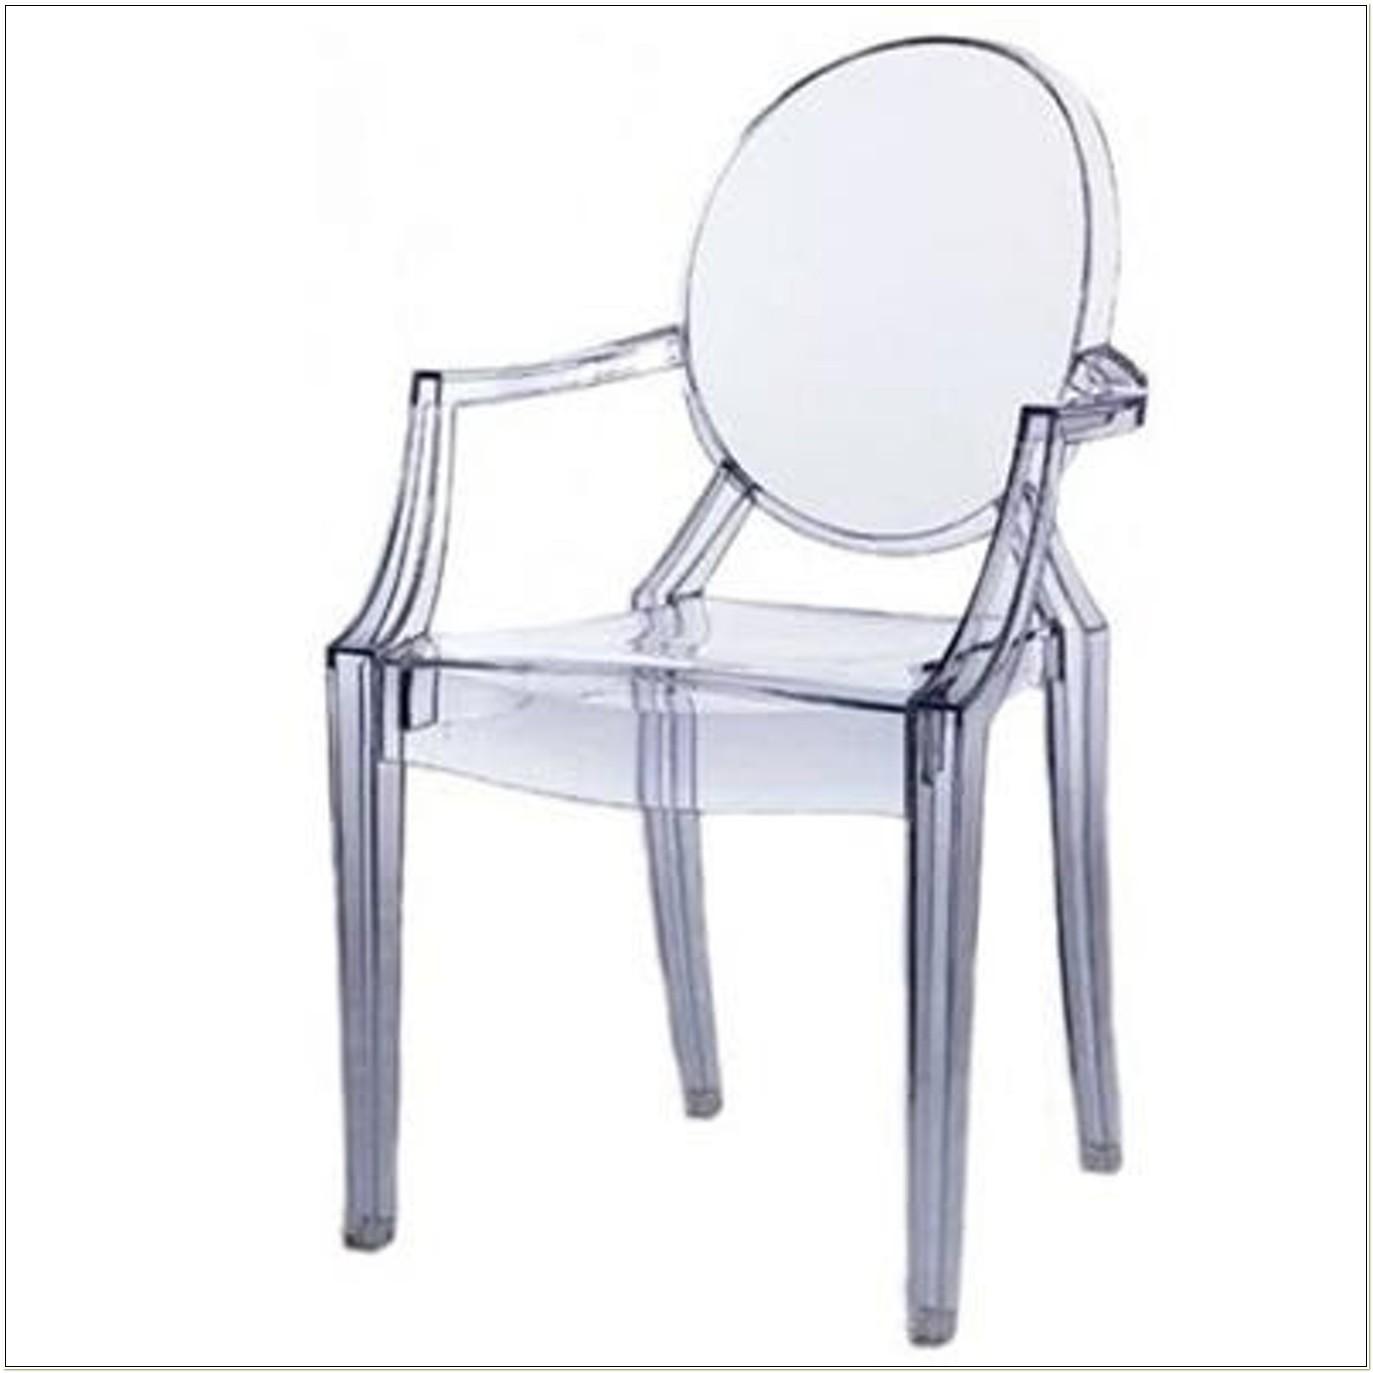 Replica Victoria Ghost Chair Nz